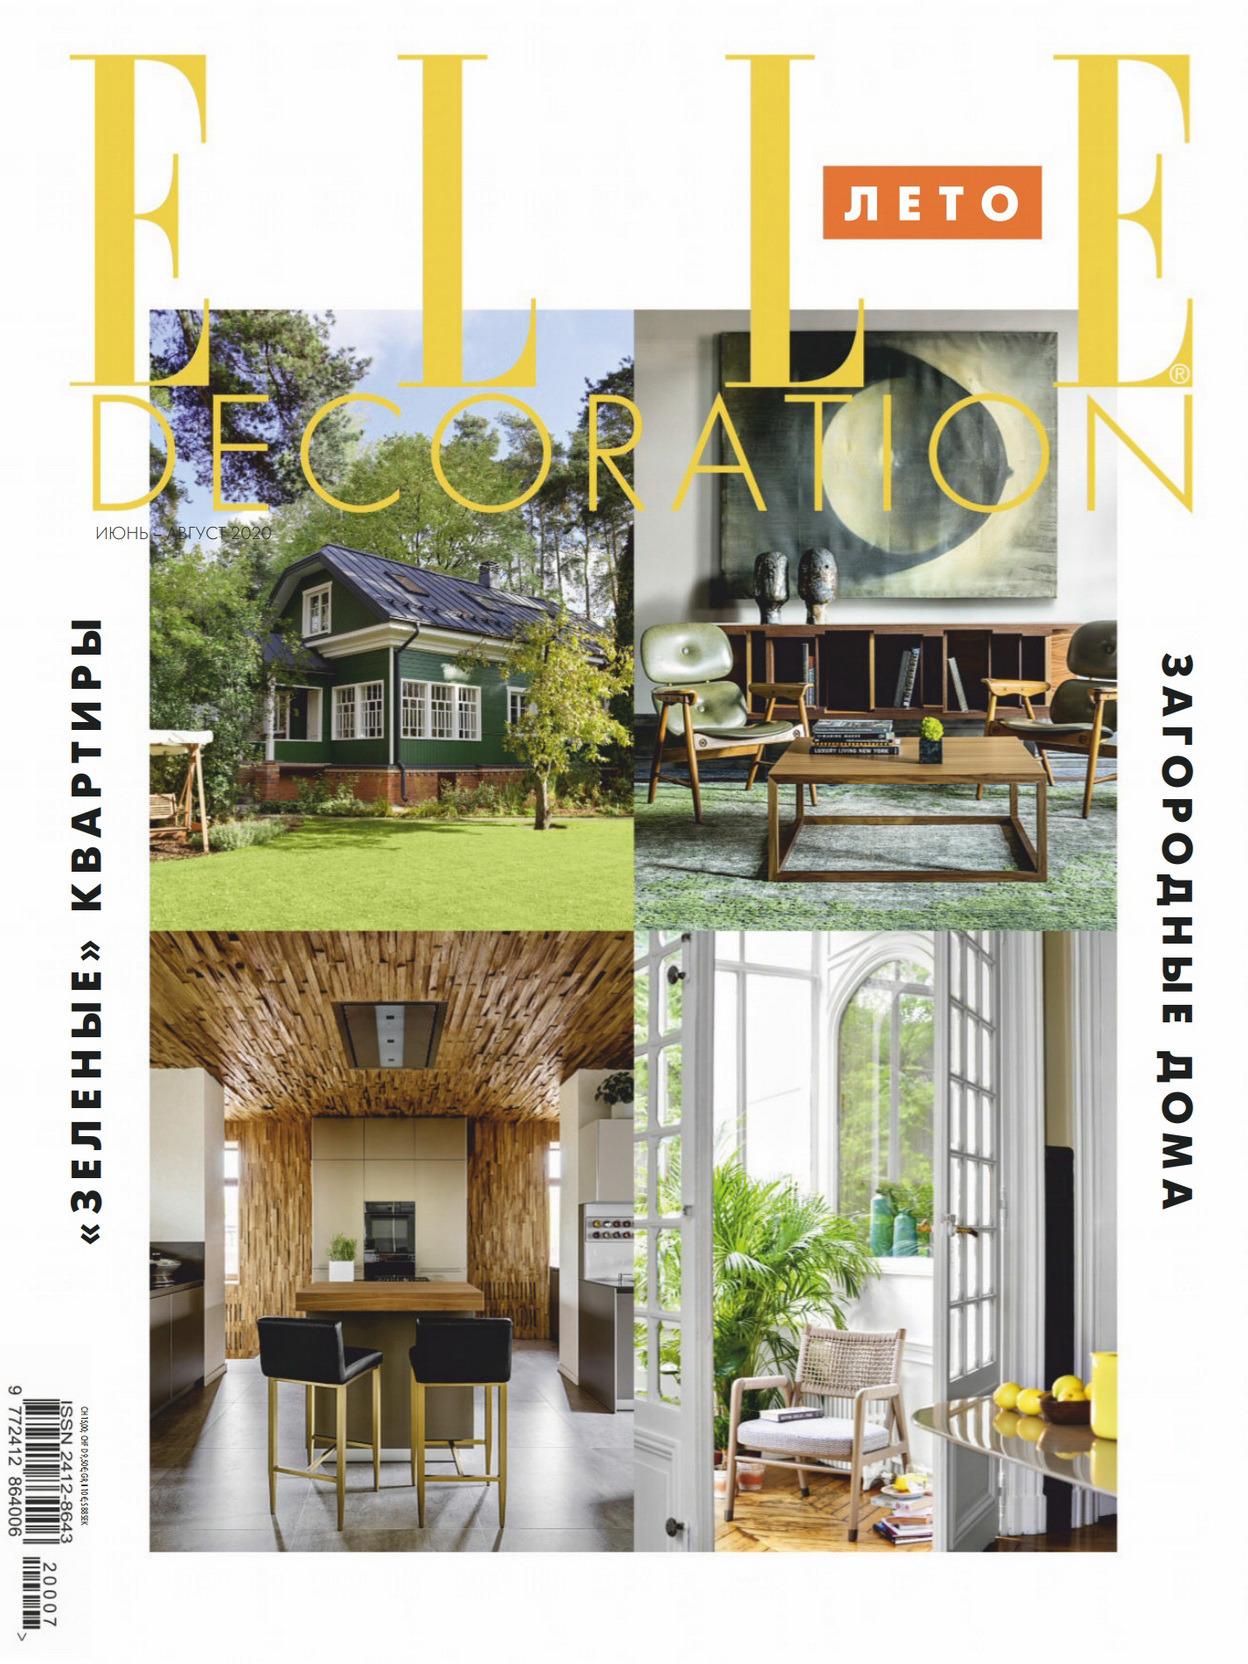 《Elle Decoration》俄罗斯版时尚家居杂志2020年06-08月号